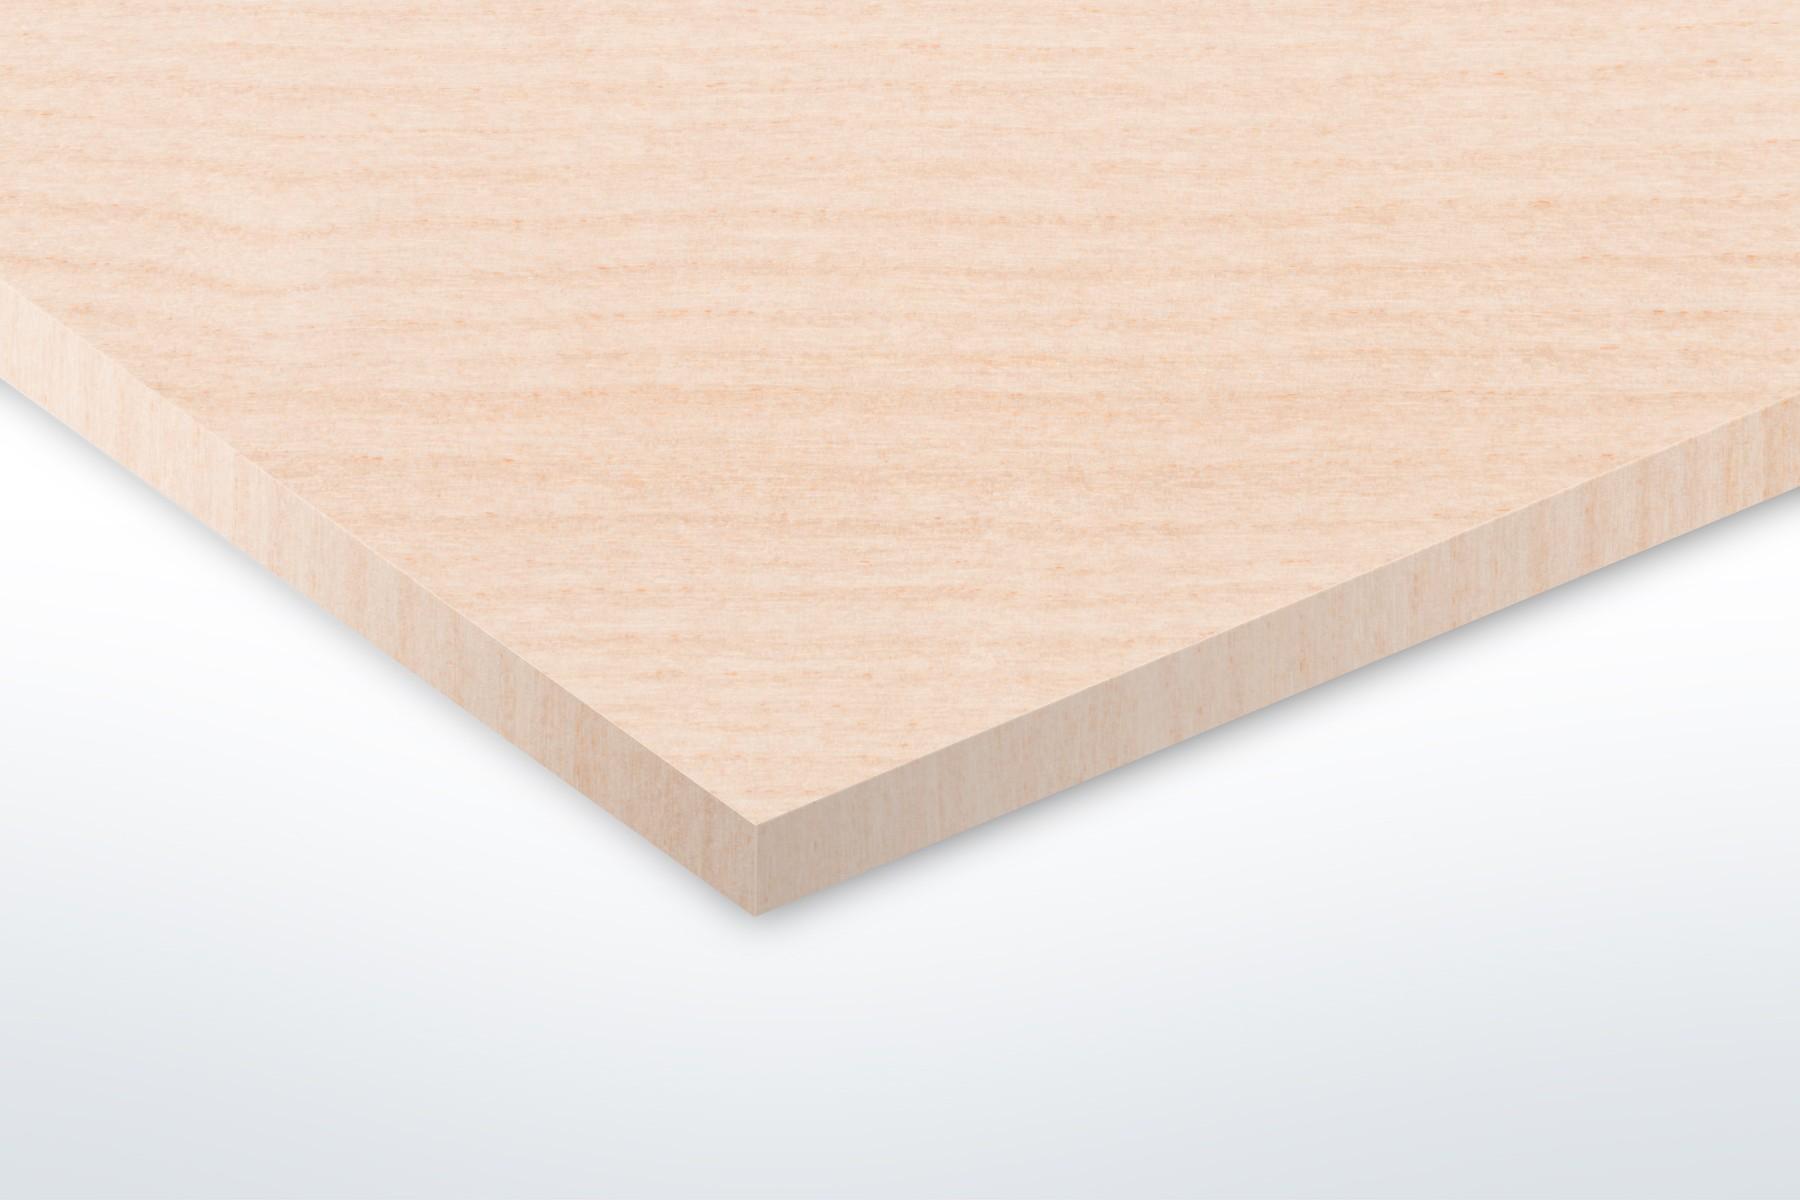 Maple - 600 x 300mm - 5mm